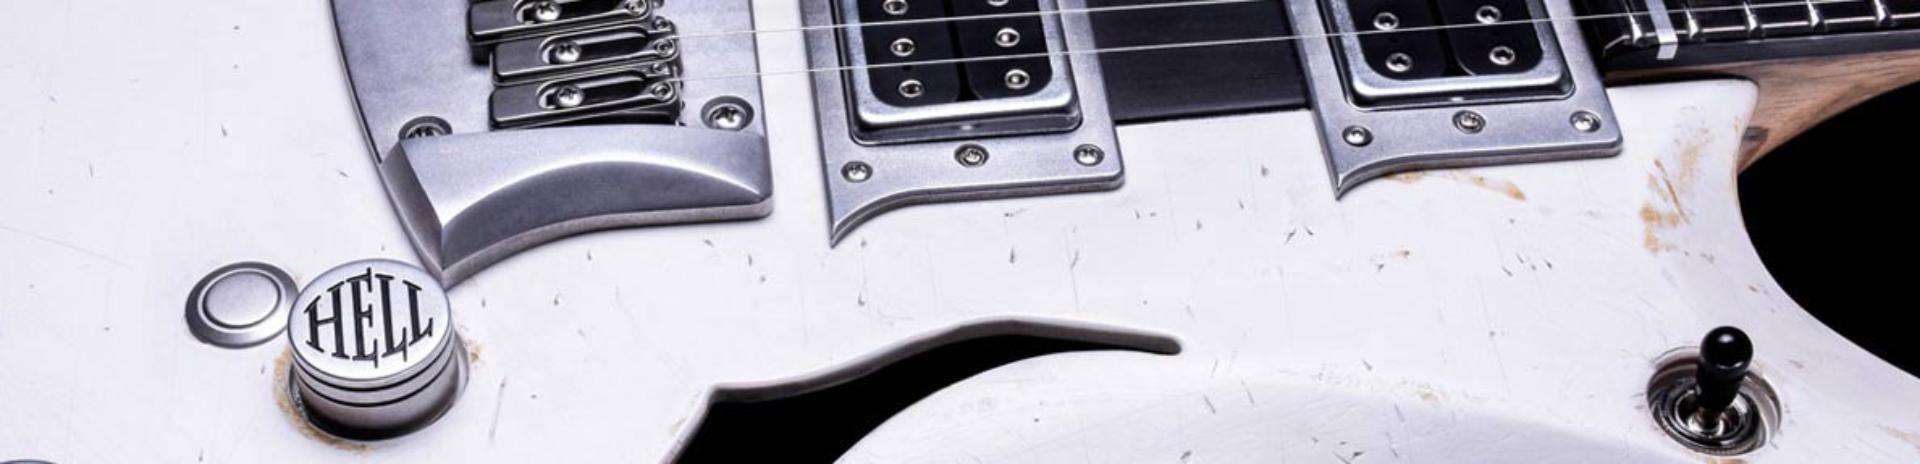 Breed - the modern oldschool guitar | Cyan Guitars